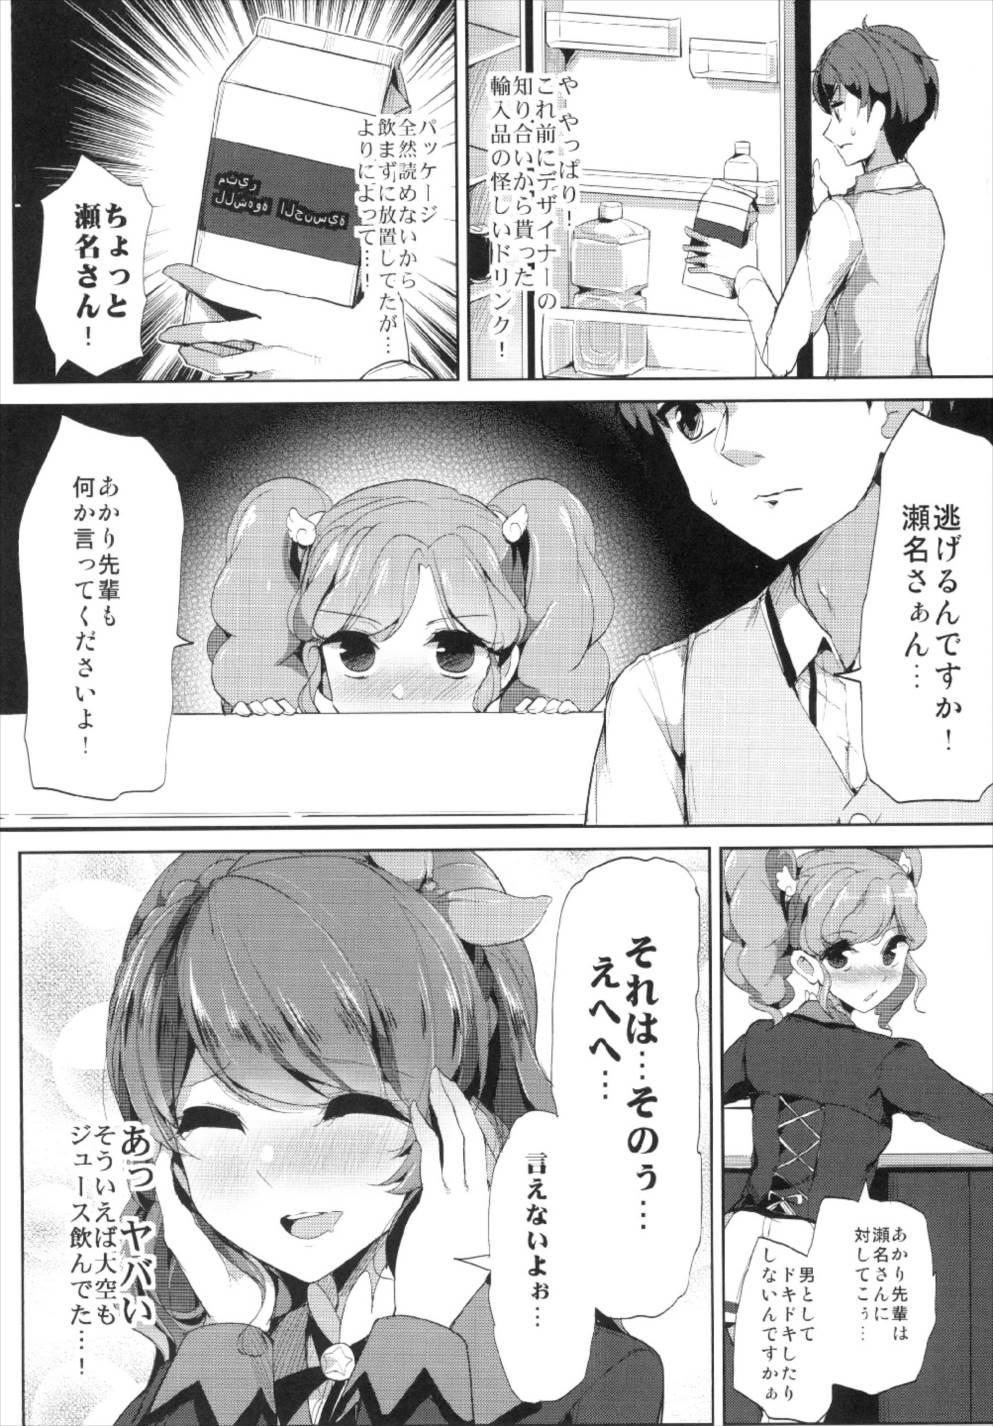 Sena-san Saitte Desu♥ 4